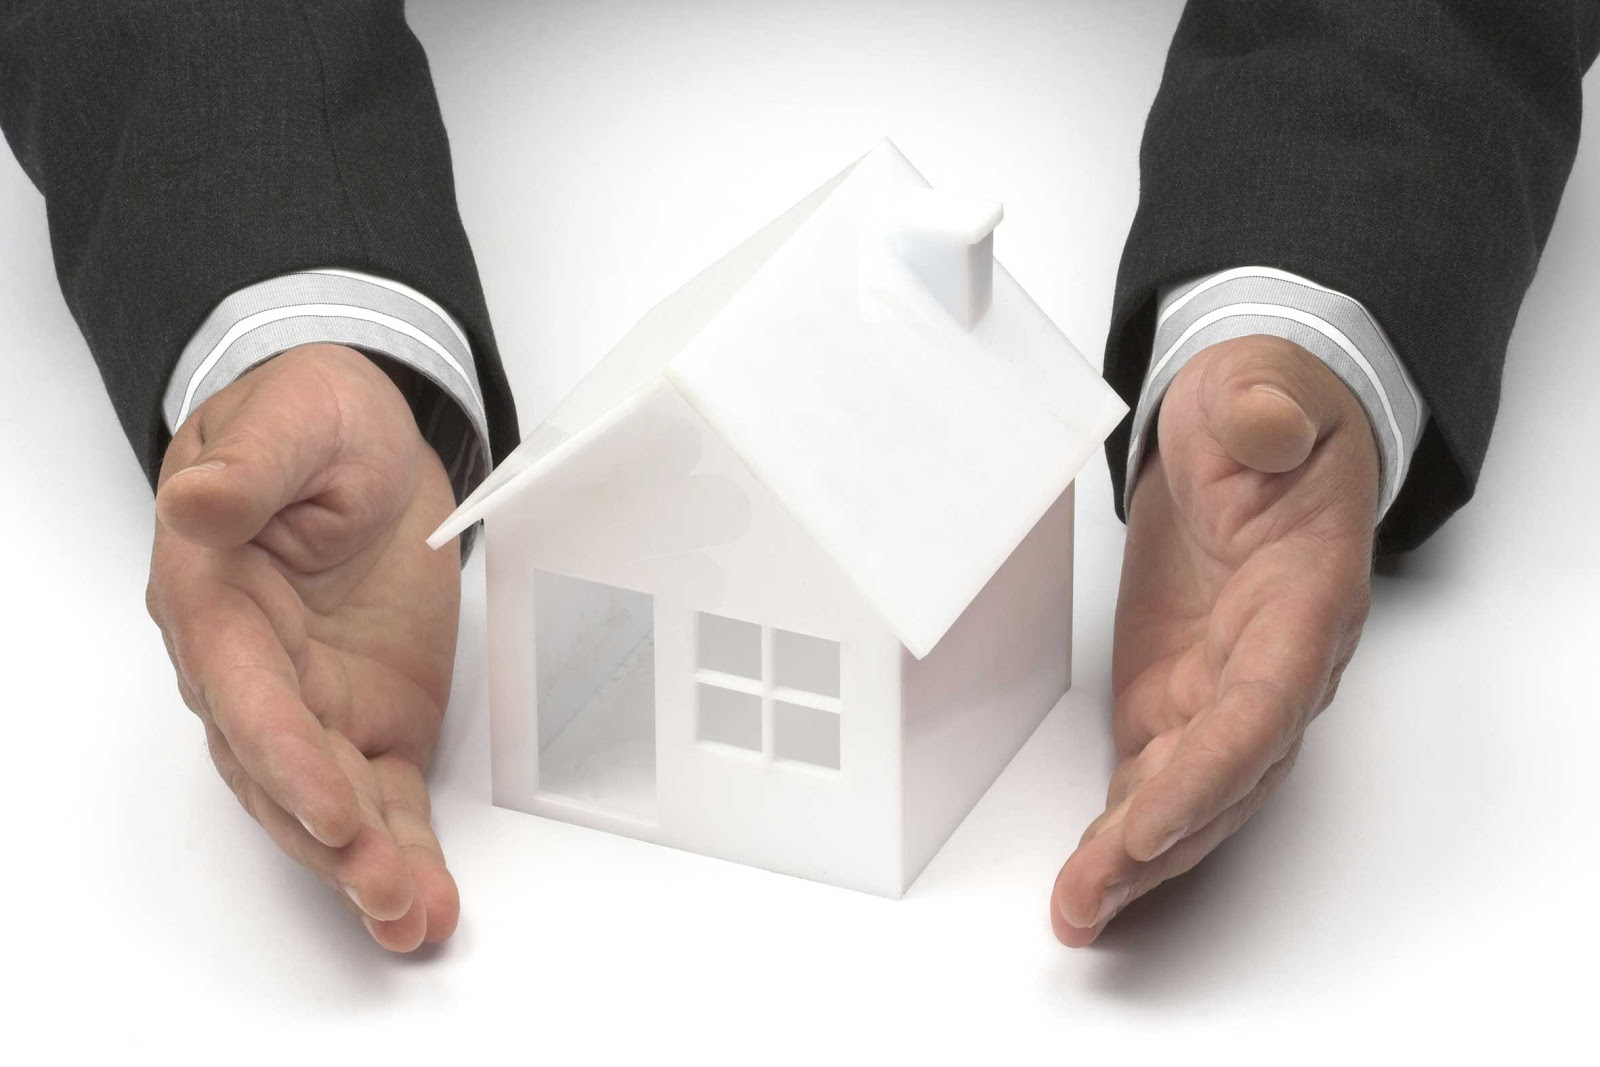 36 ley hipotecaria: